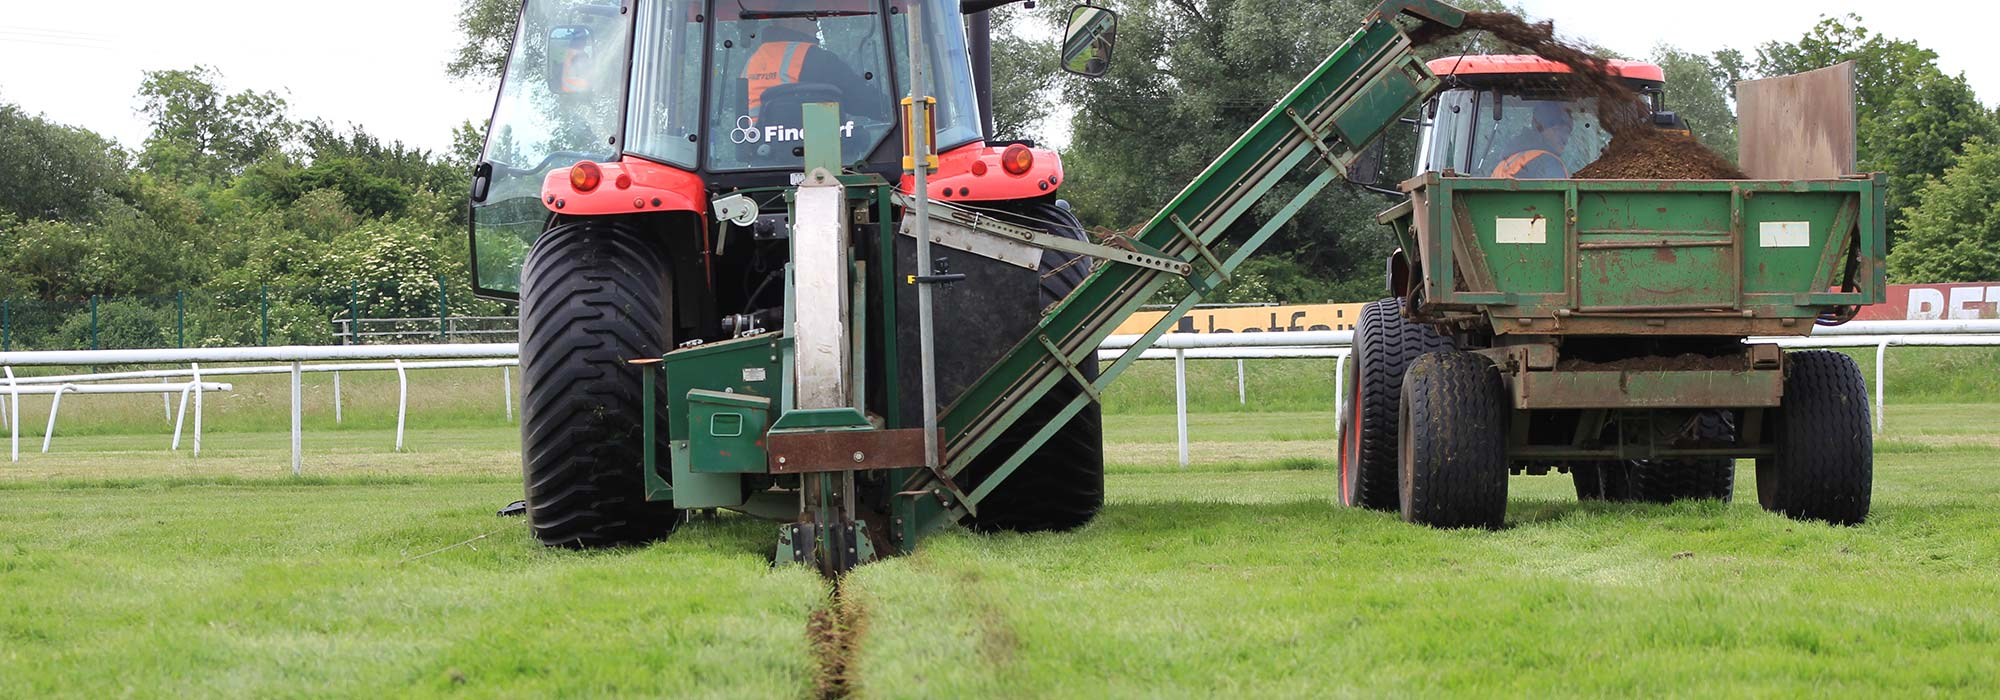 Equestrian Facilities and Racecourses Photo